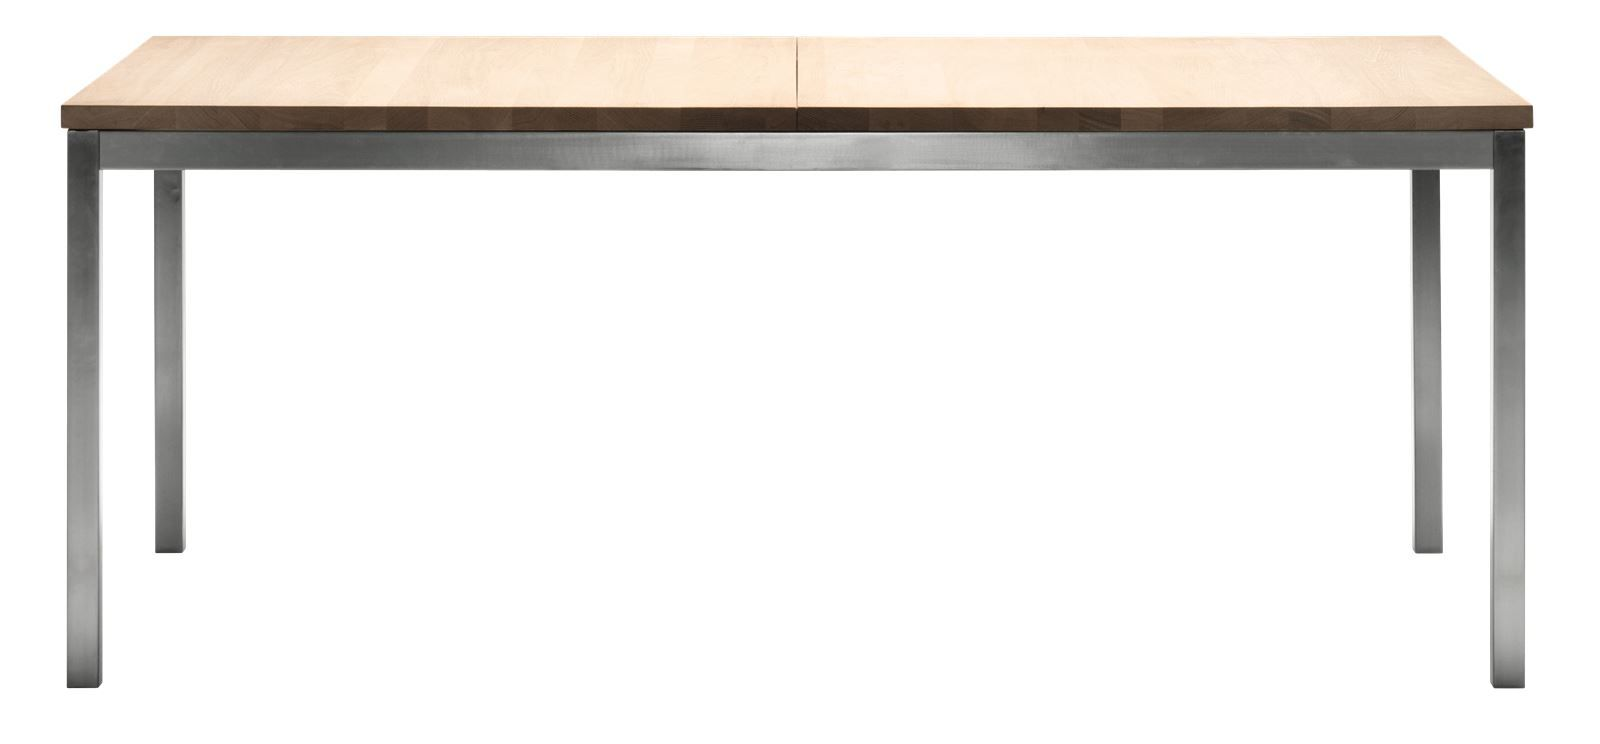 Nordic Spisebord 90x180 - Massiv - Hvitoljet eik - Bolia - 11199,30 ...